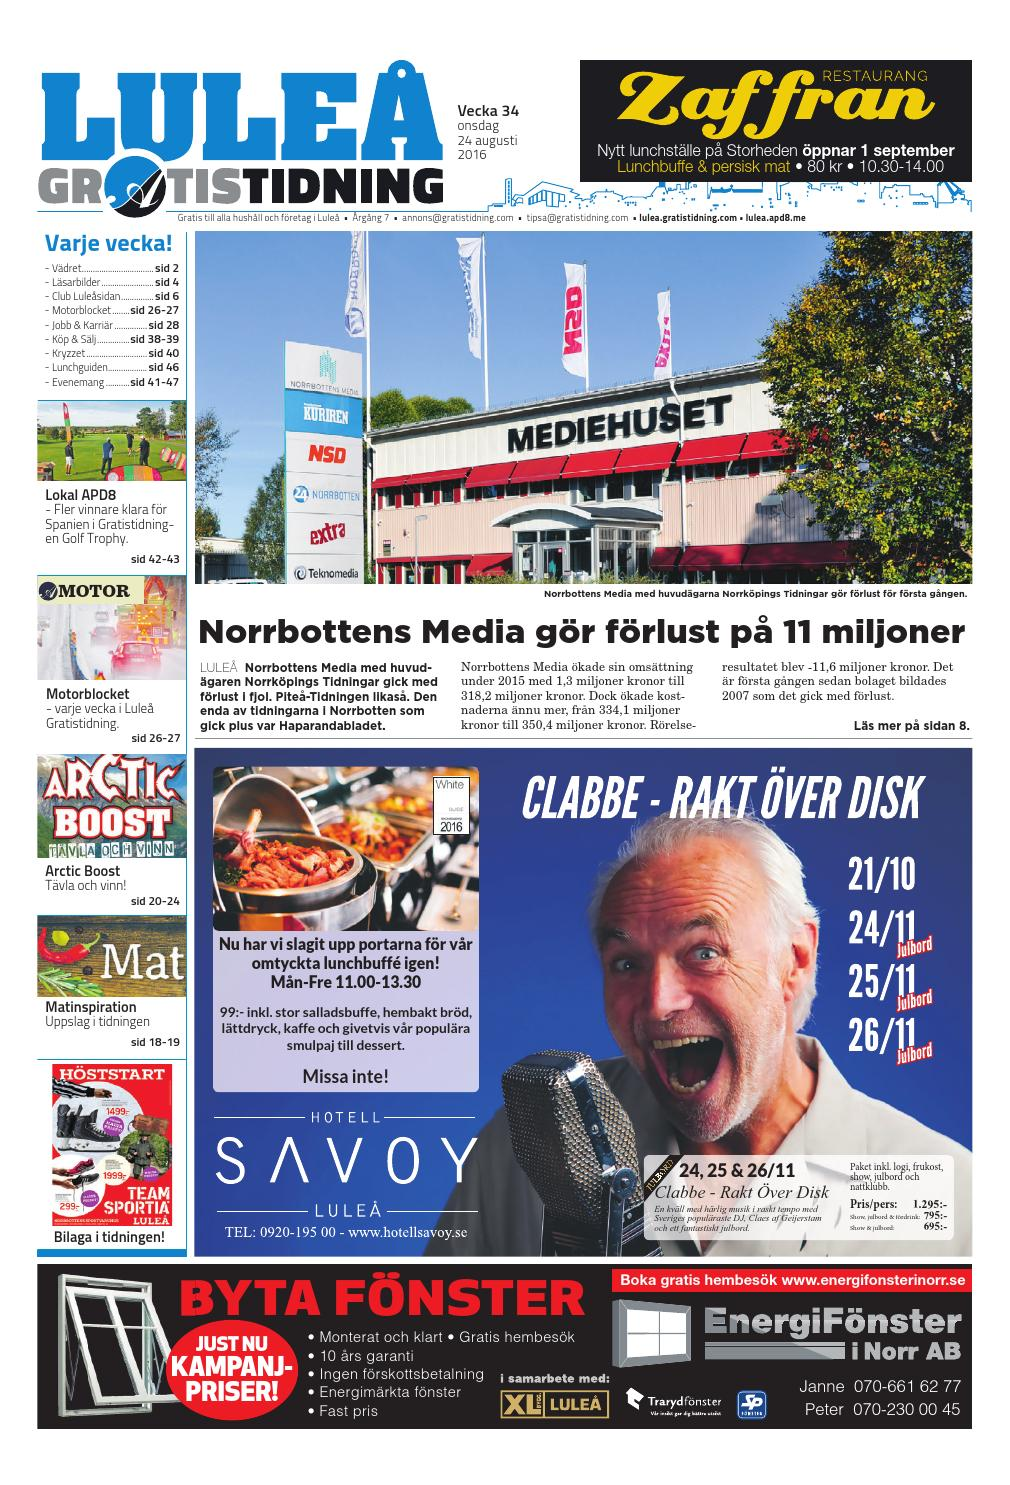 huge discount 58cd4 af848 Luleå Gratistidning med Team Sportia bilaga by Svenska Civildatalogerna AB  - issuu